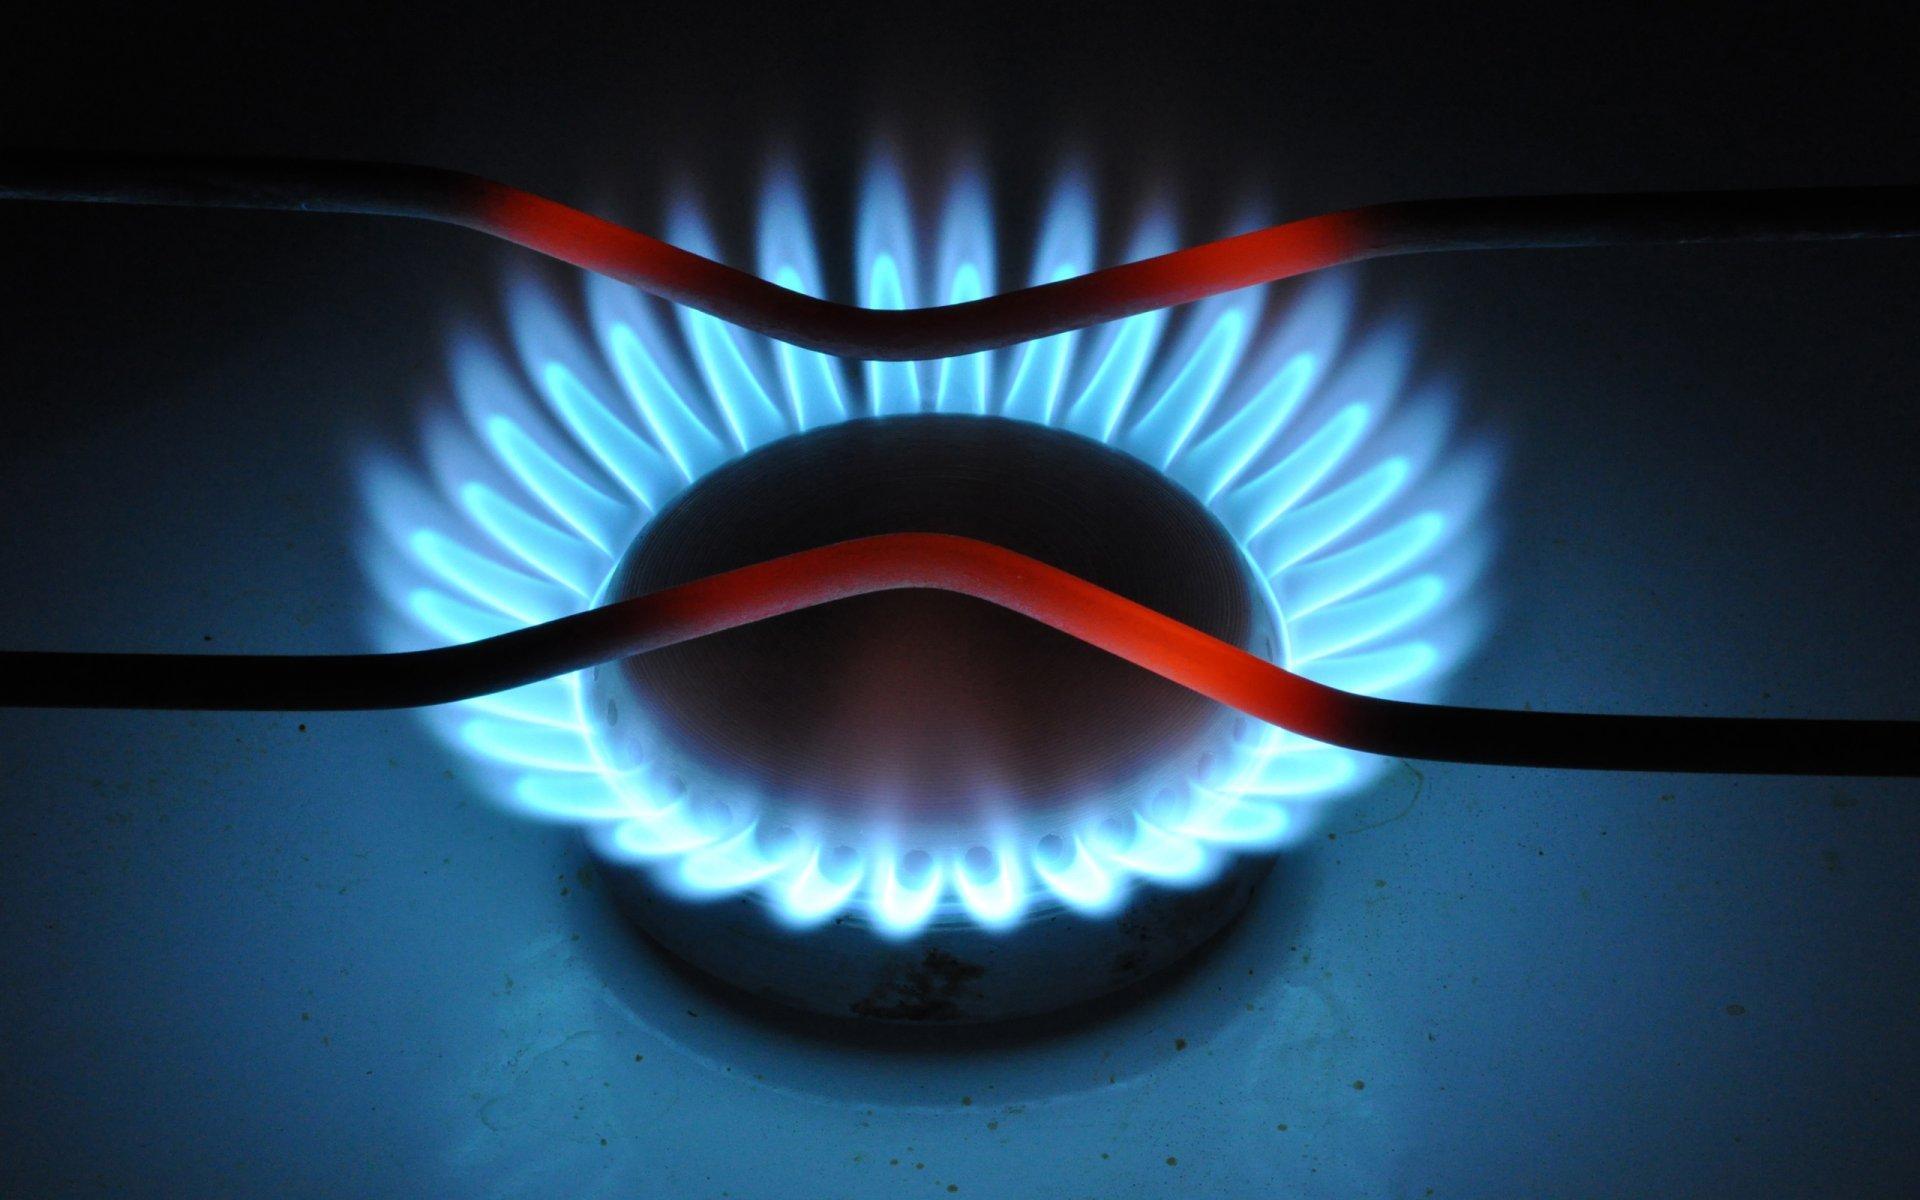 gas ring stove computer wallpaper 561